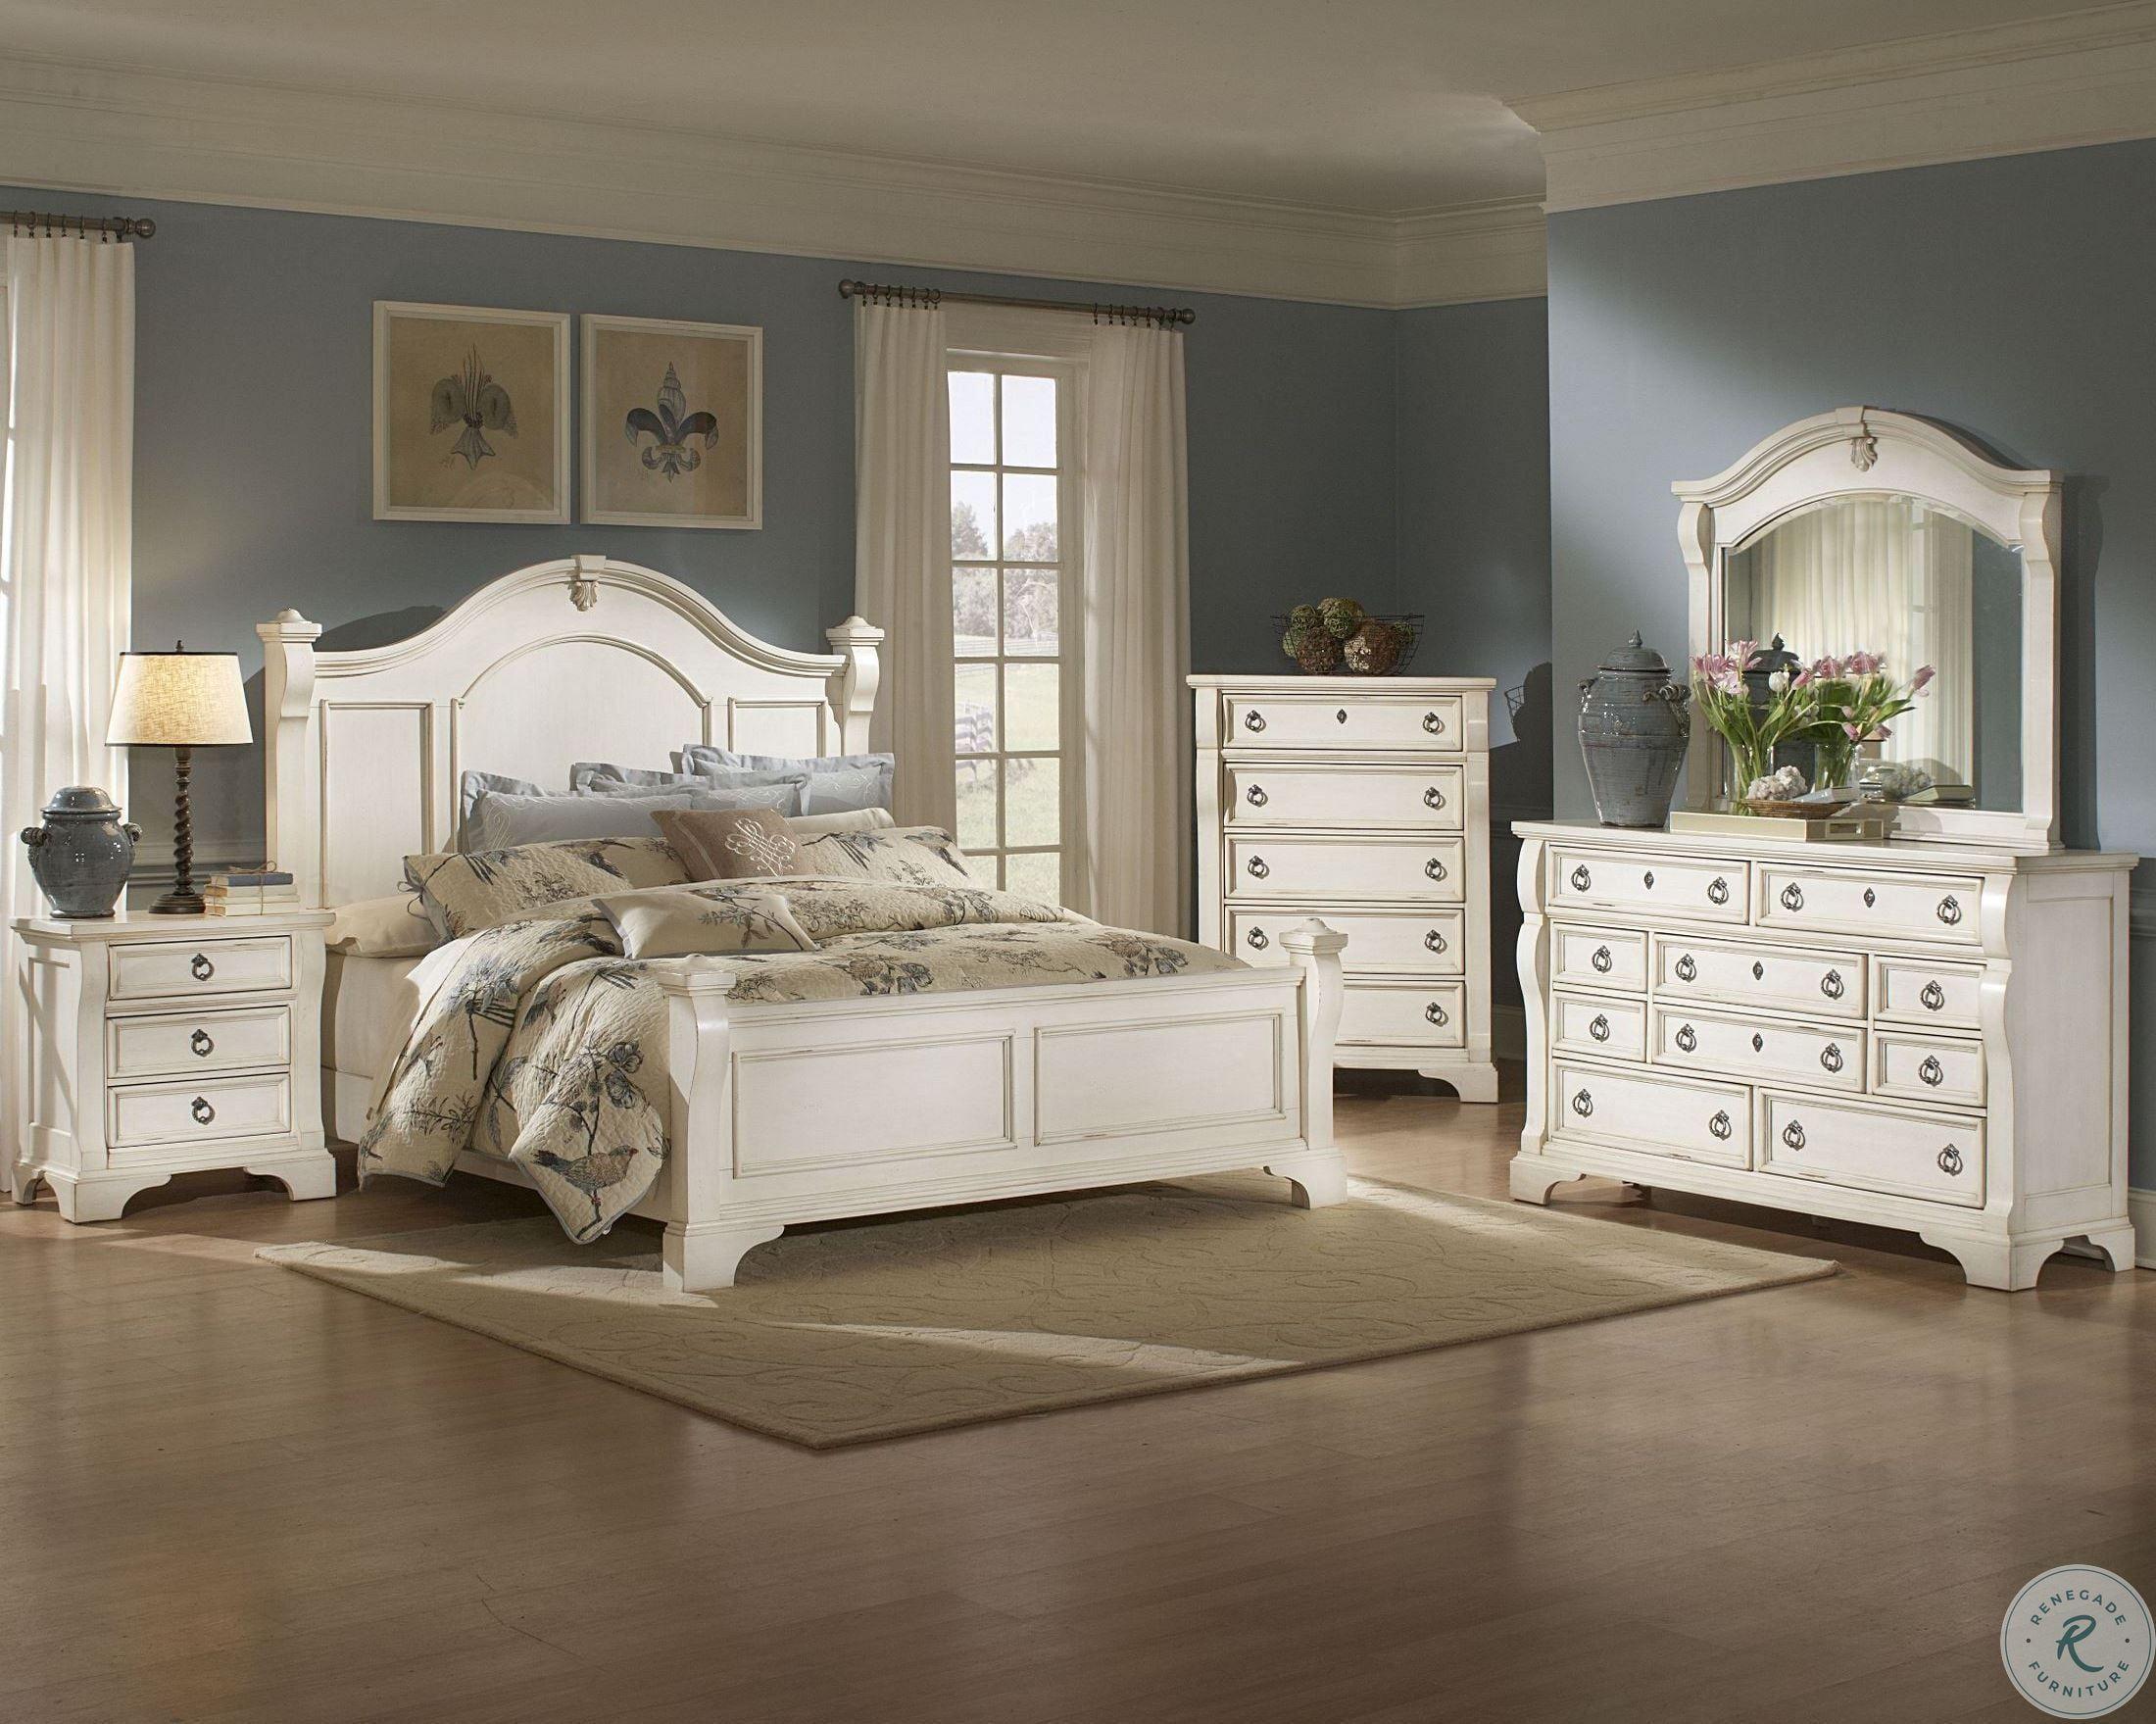 Heirloom White Poster Bedroom Set Amw 2910 50pos Room White Bedroom Set Antique White Bedroom Furniture Bedroom Set